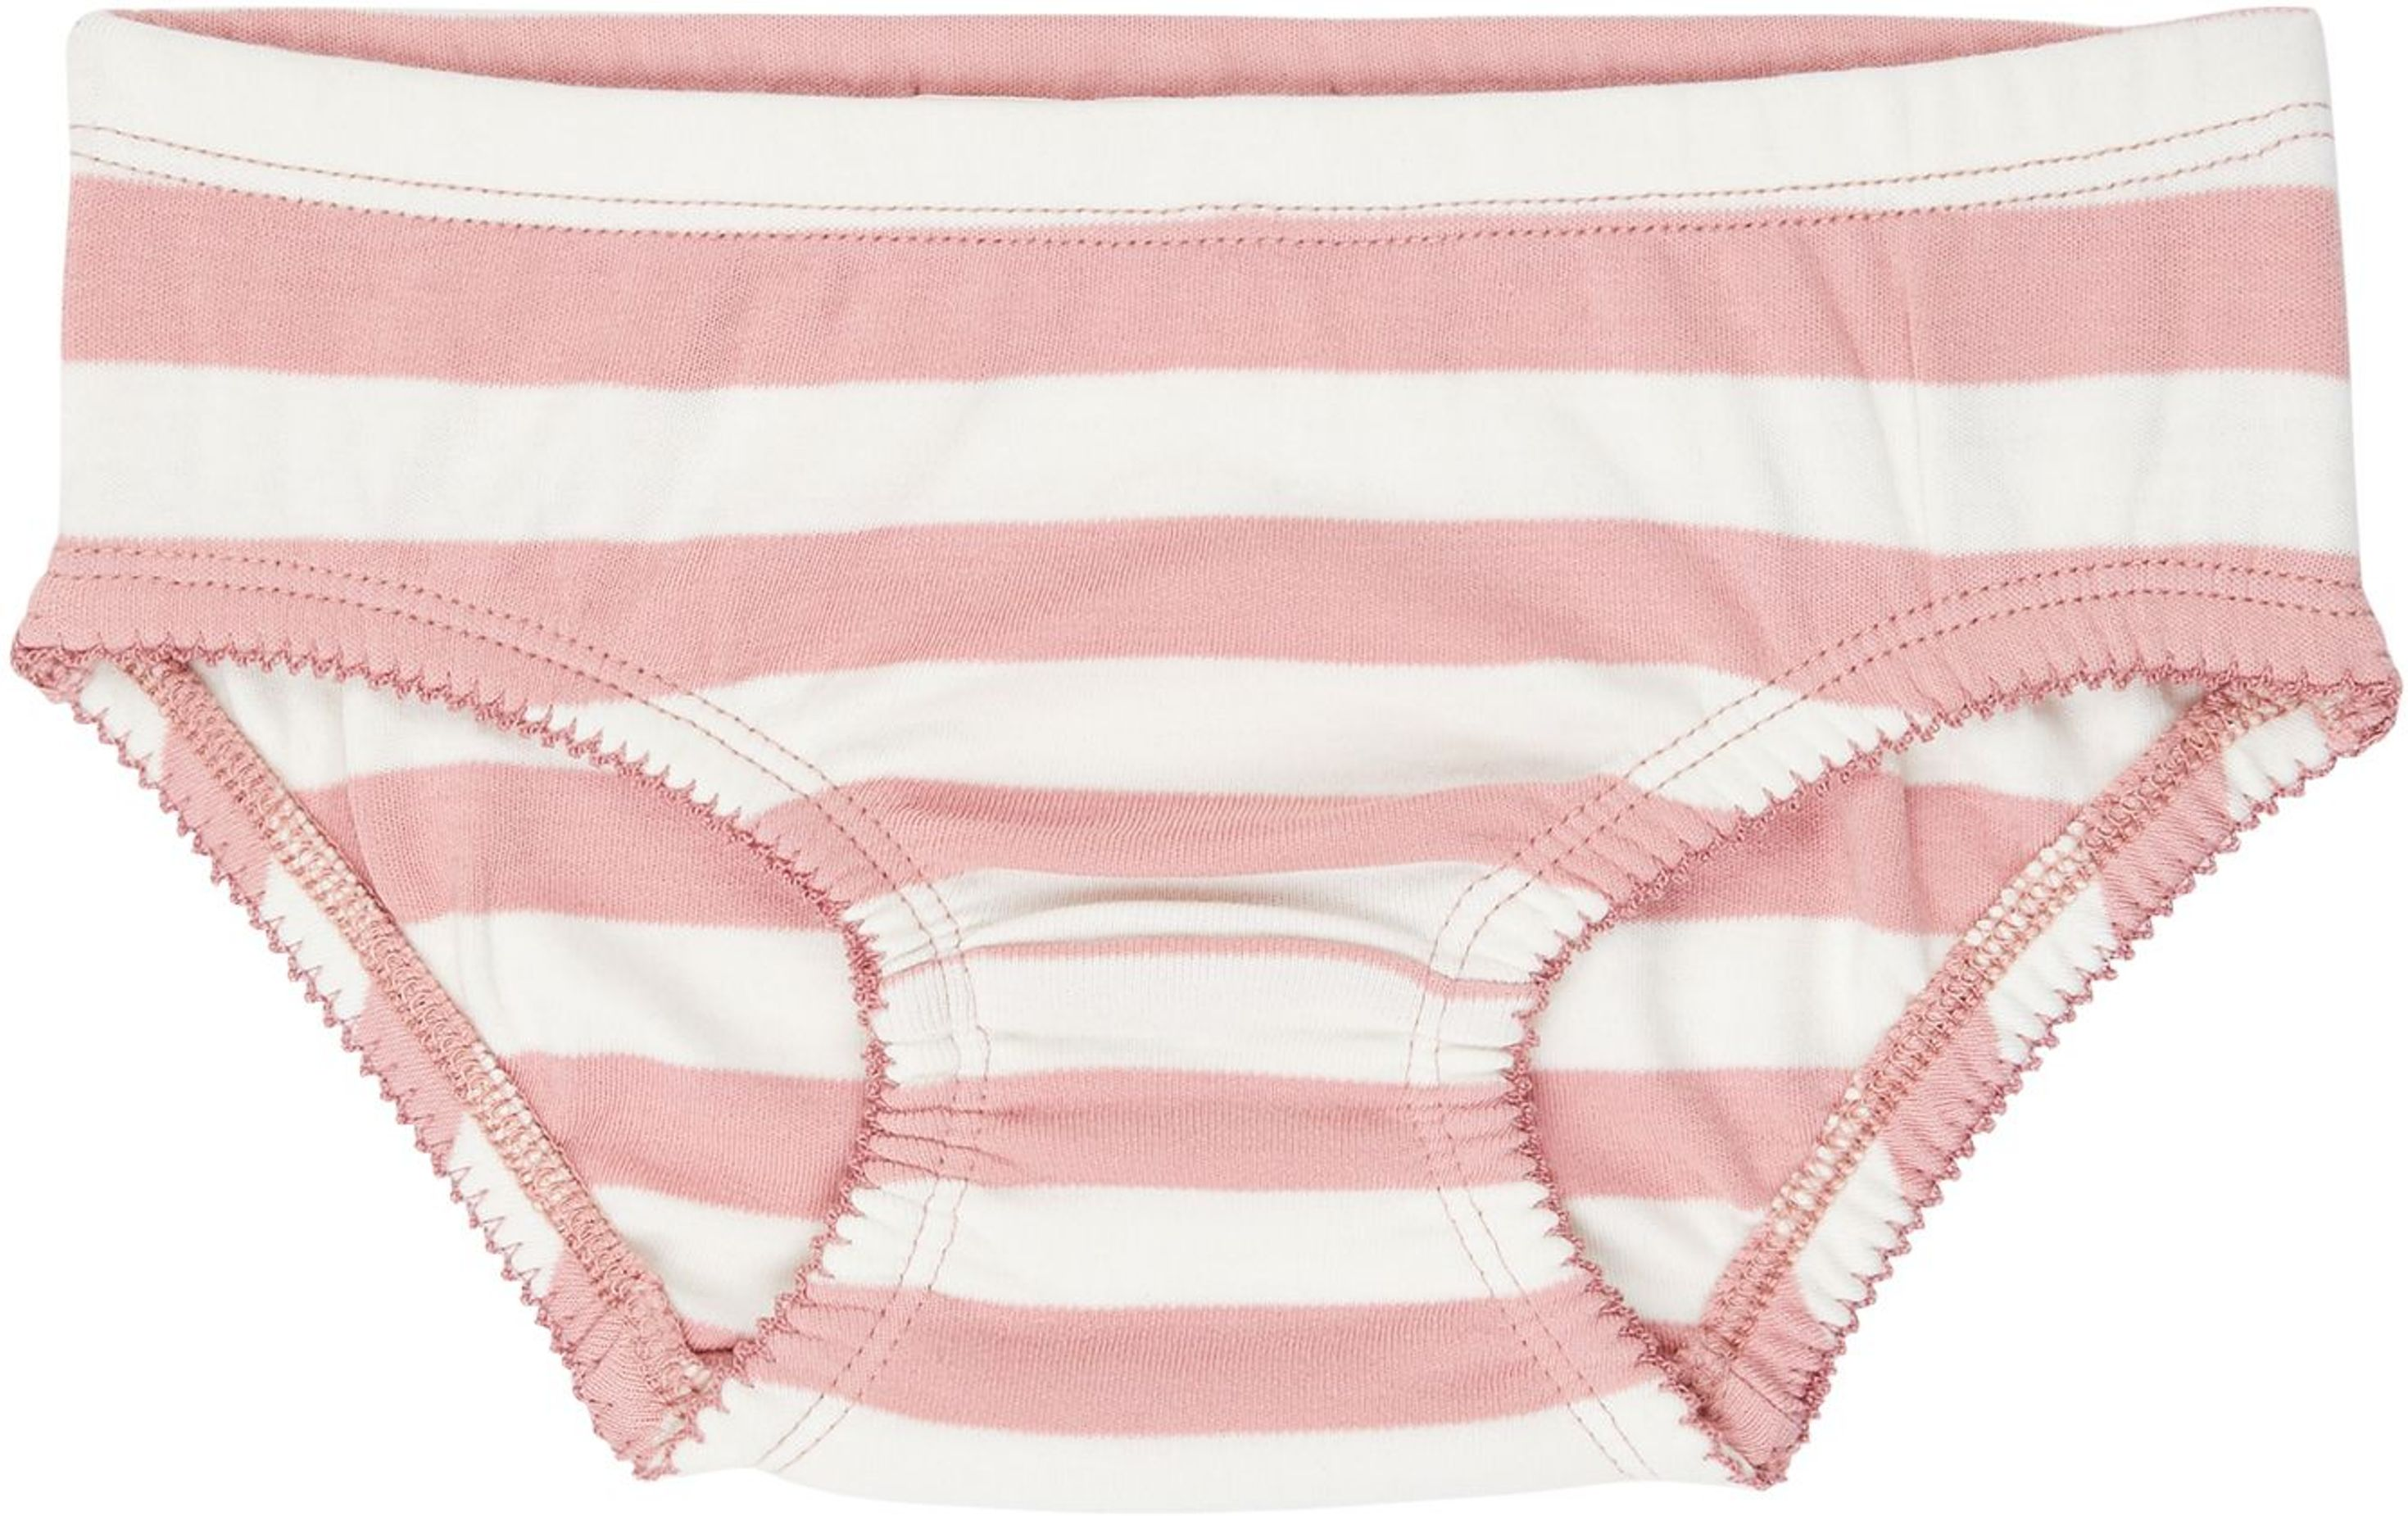 Sense Organic PARIS Slips - 2 Pack rose stripes